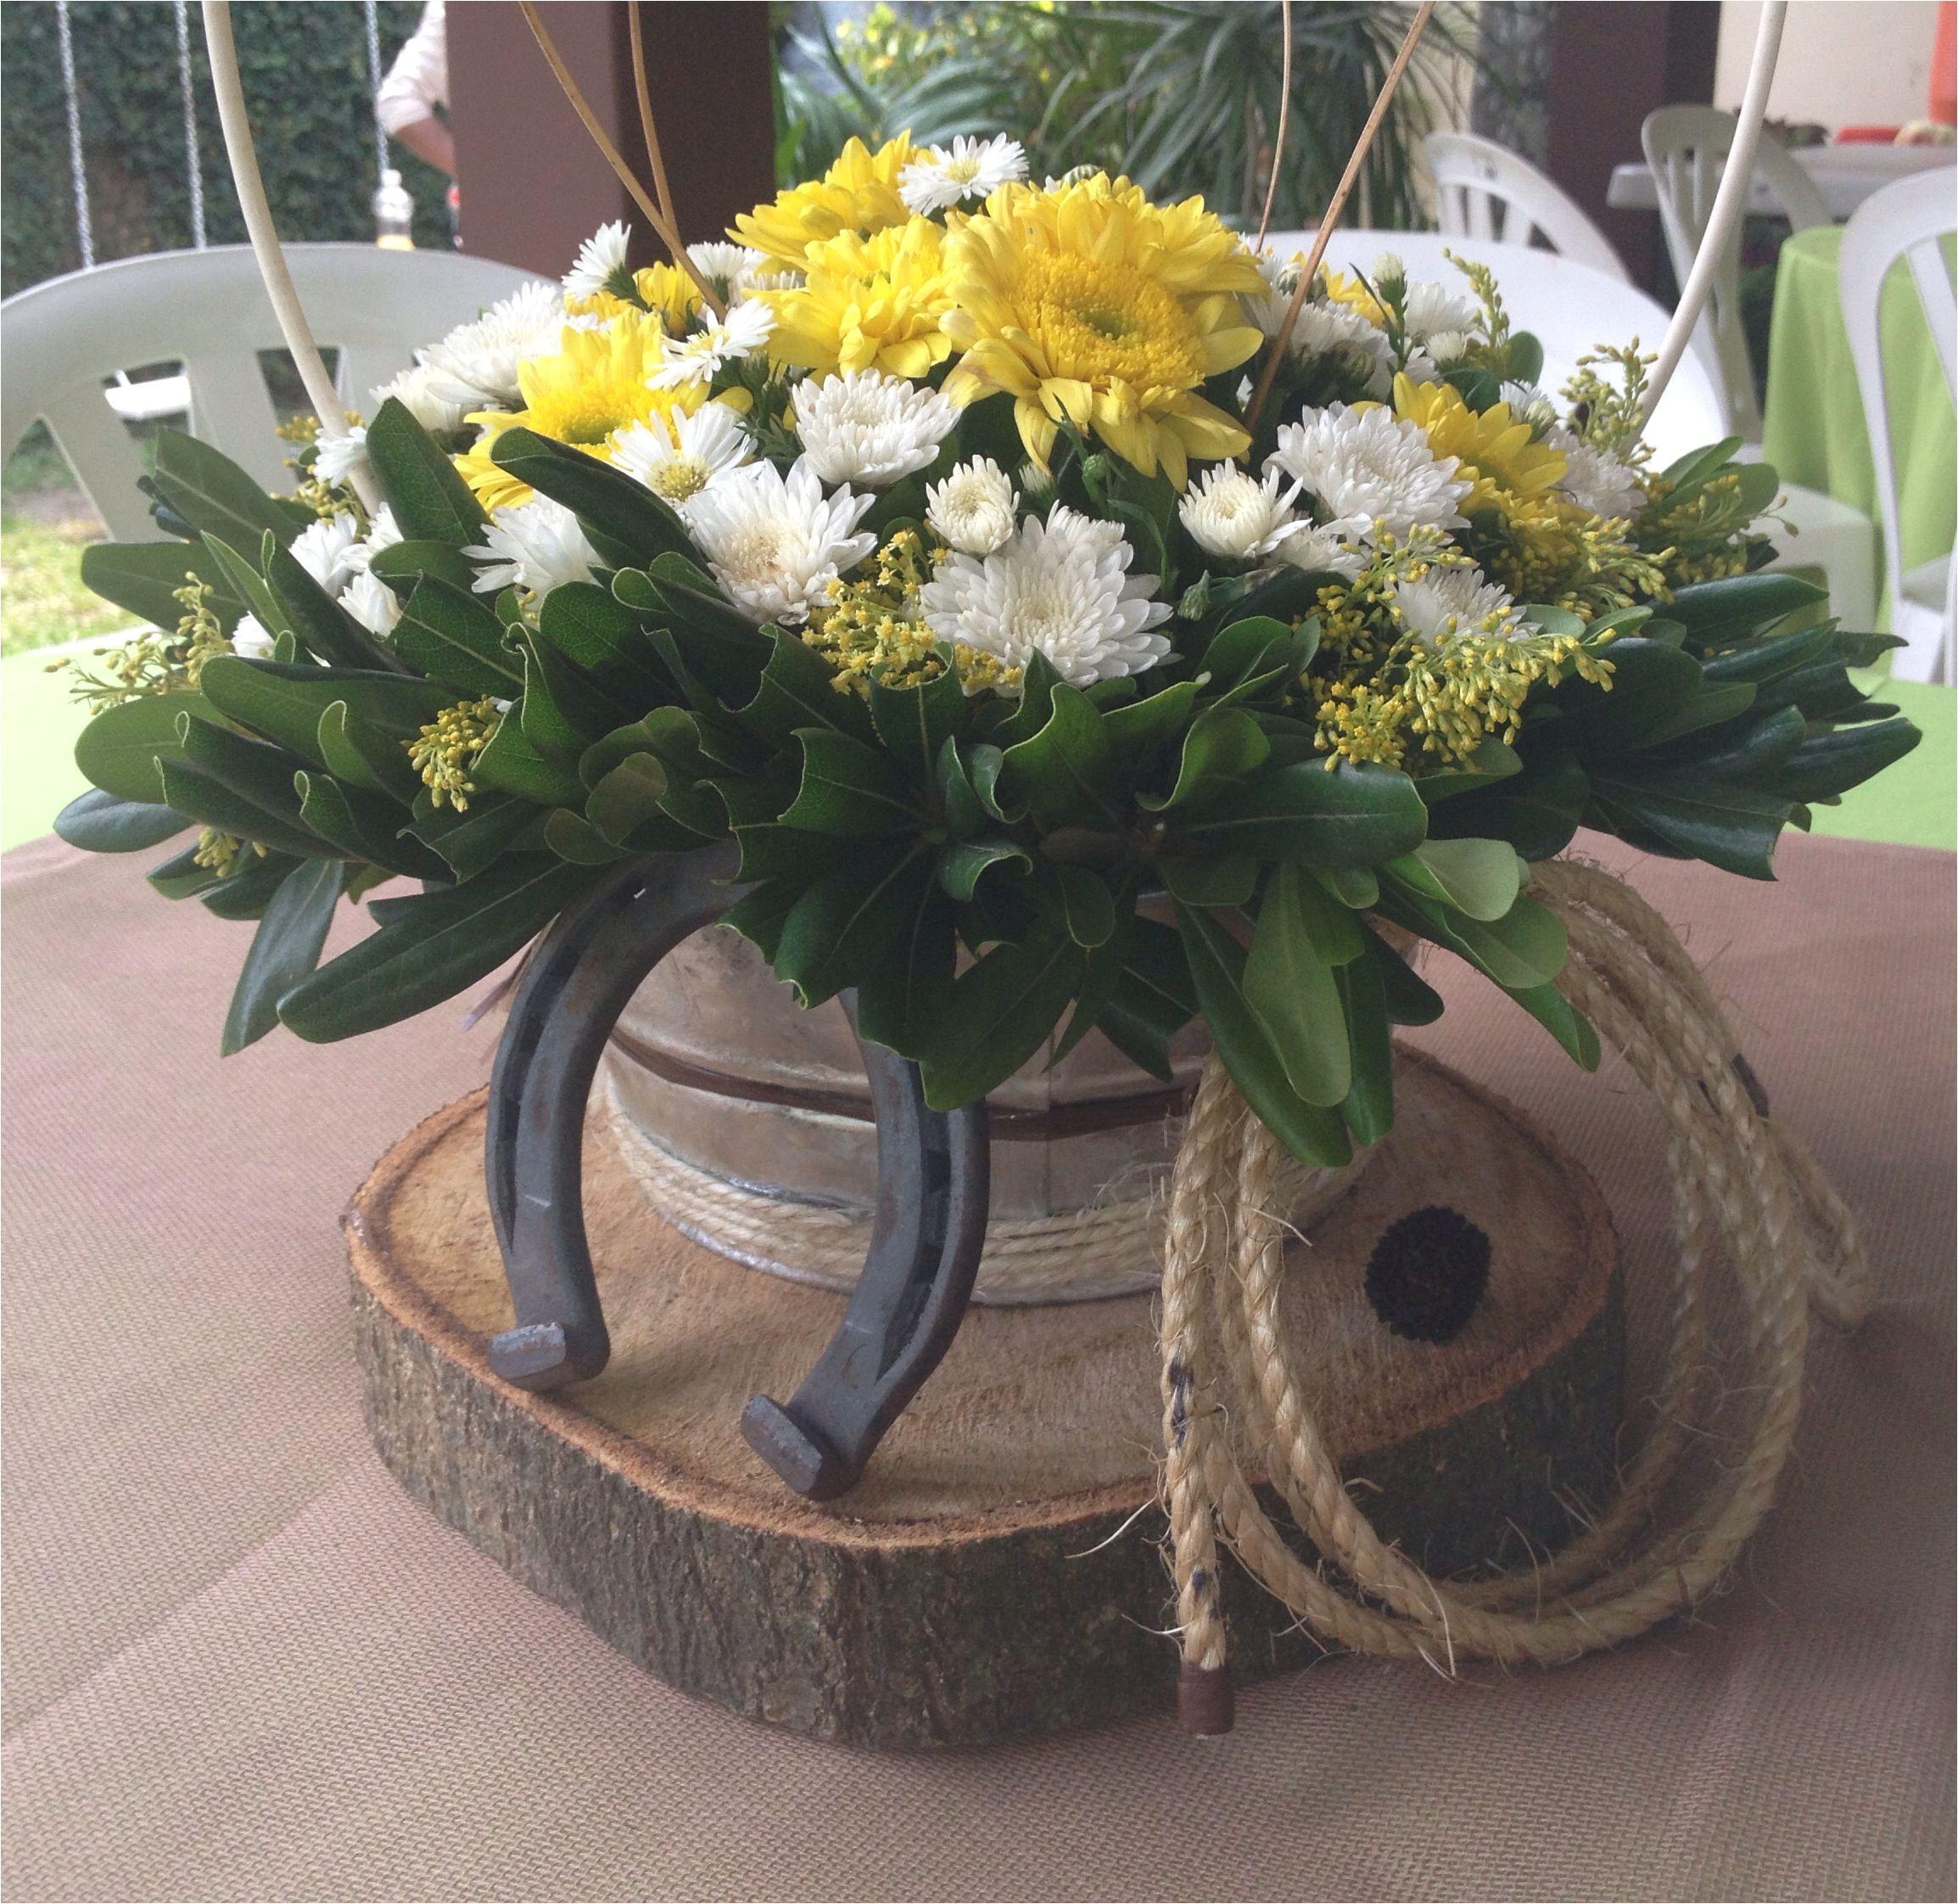 centro de mesa rancho vaquero cowboy centerpiece boda vaquera fiesta vaquera vestido charro